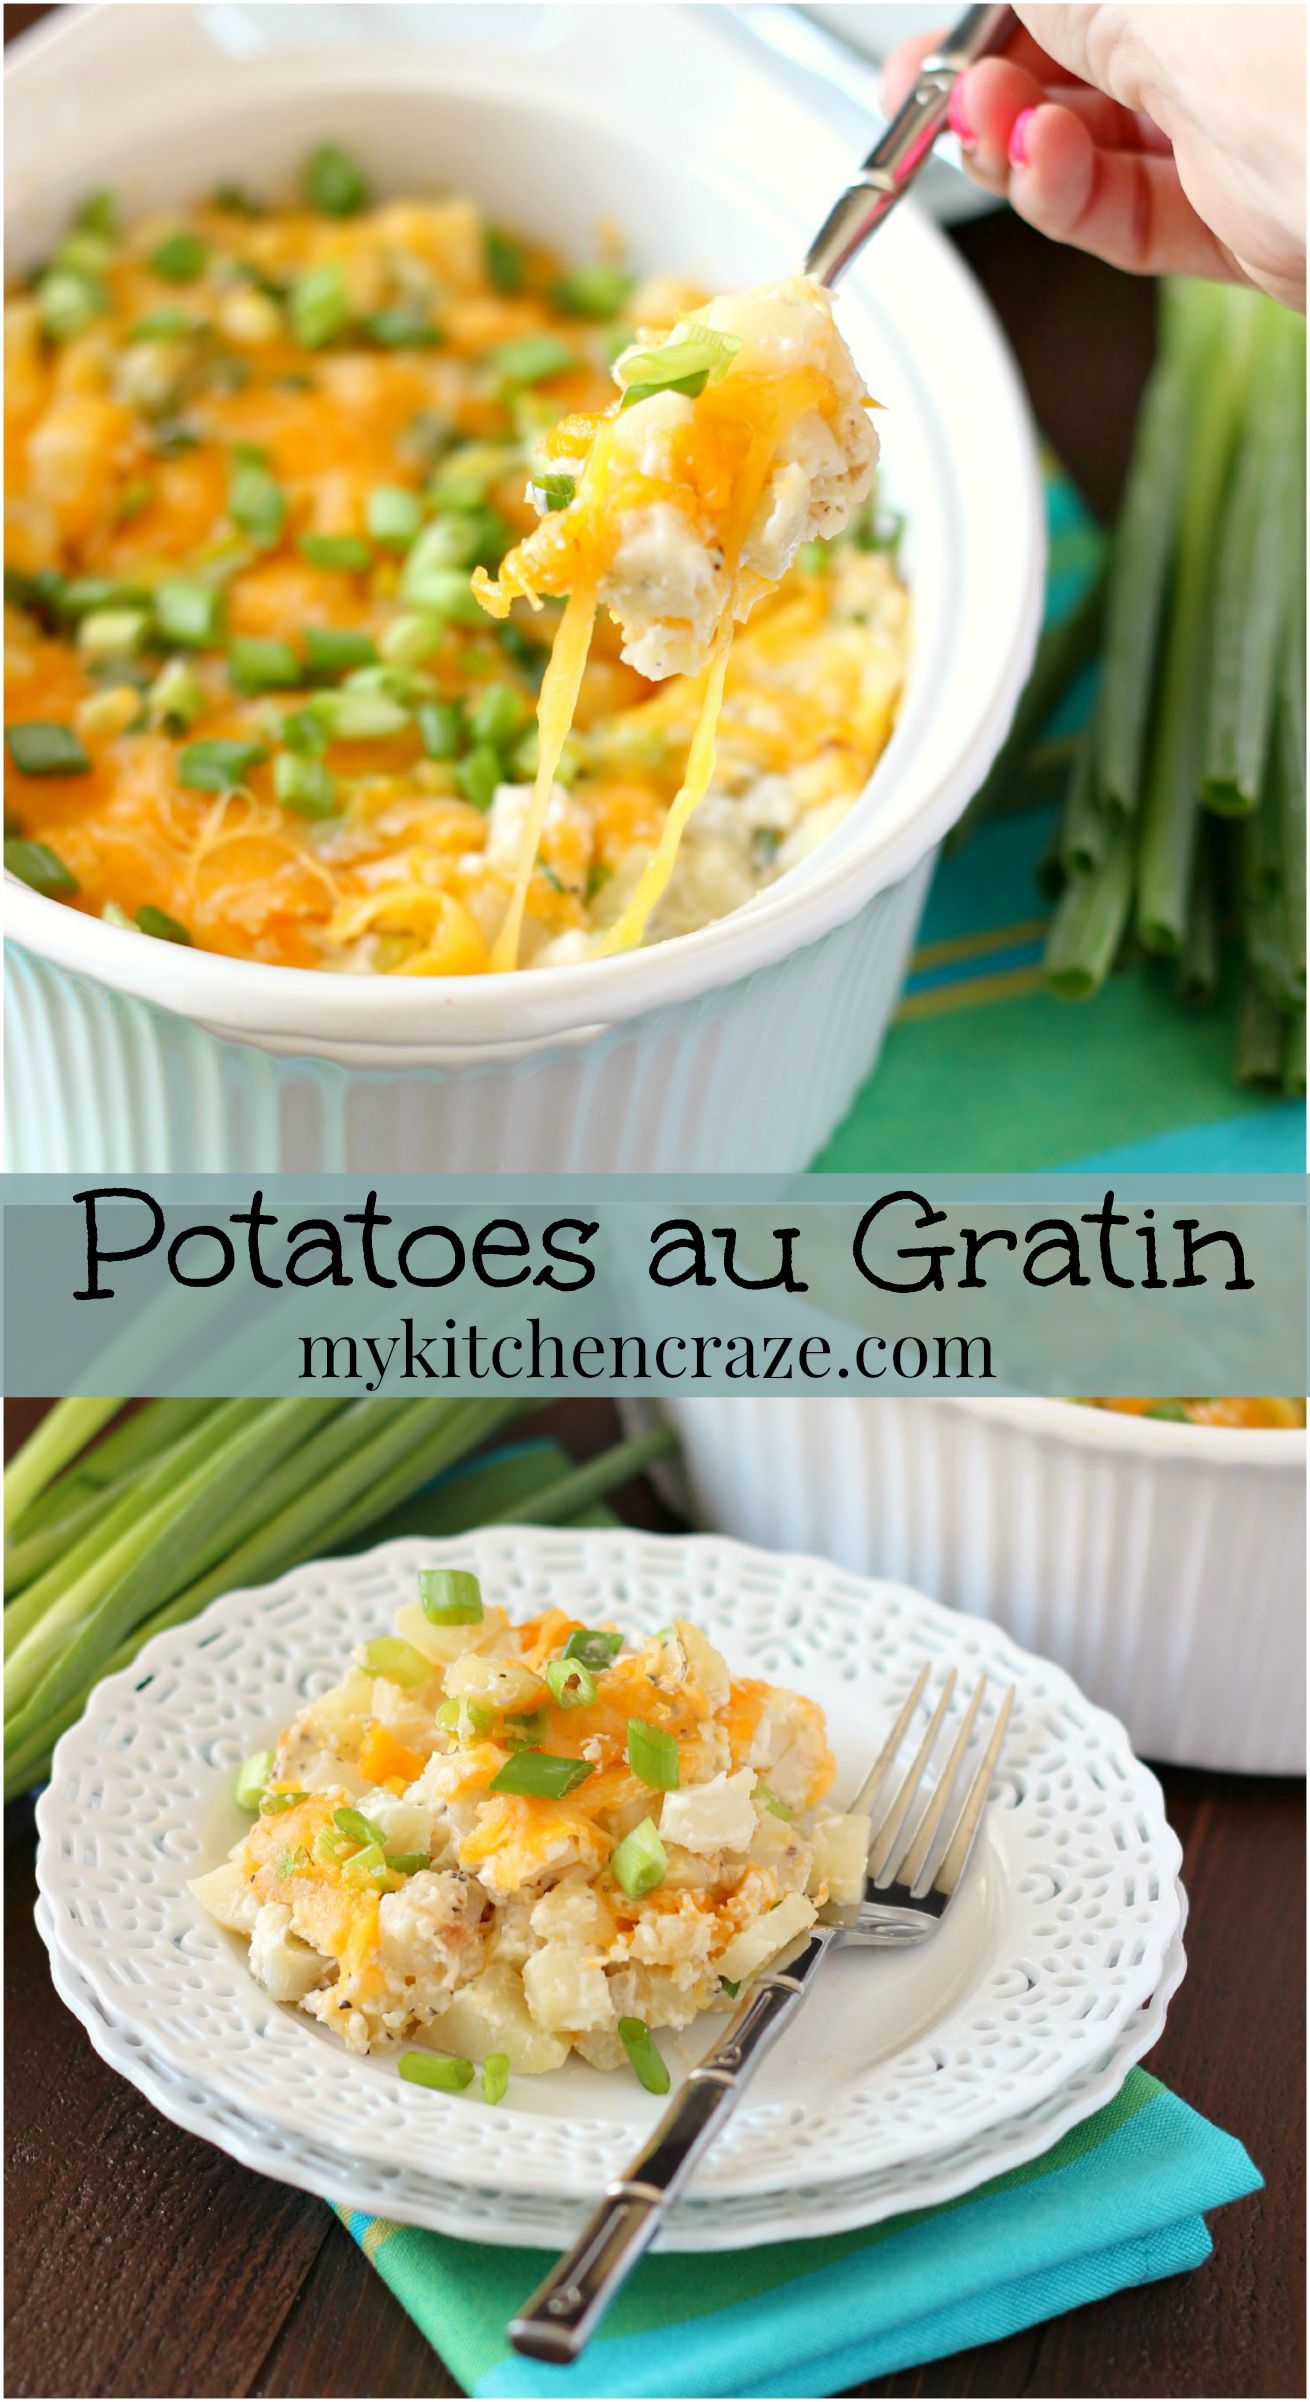 Potatoes au Gratin ~ mykitchencraze.com